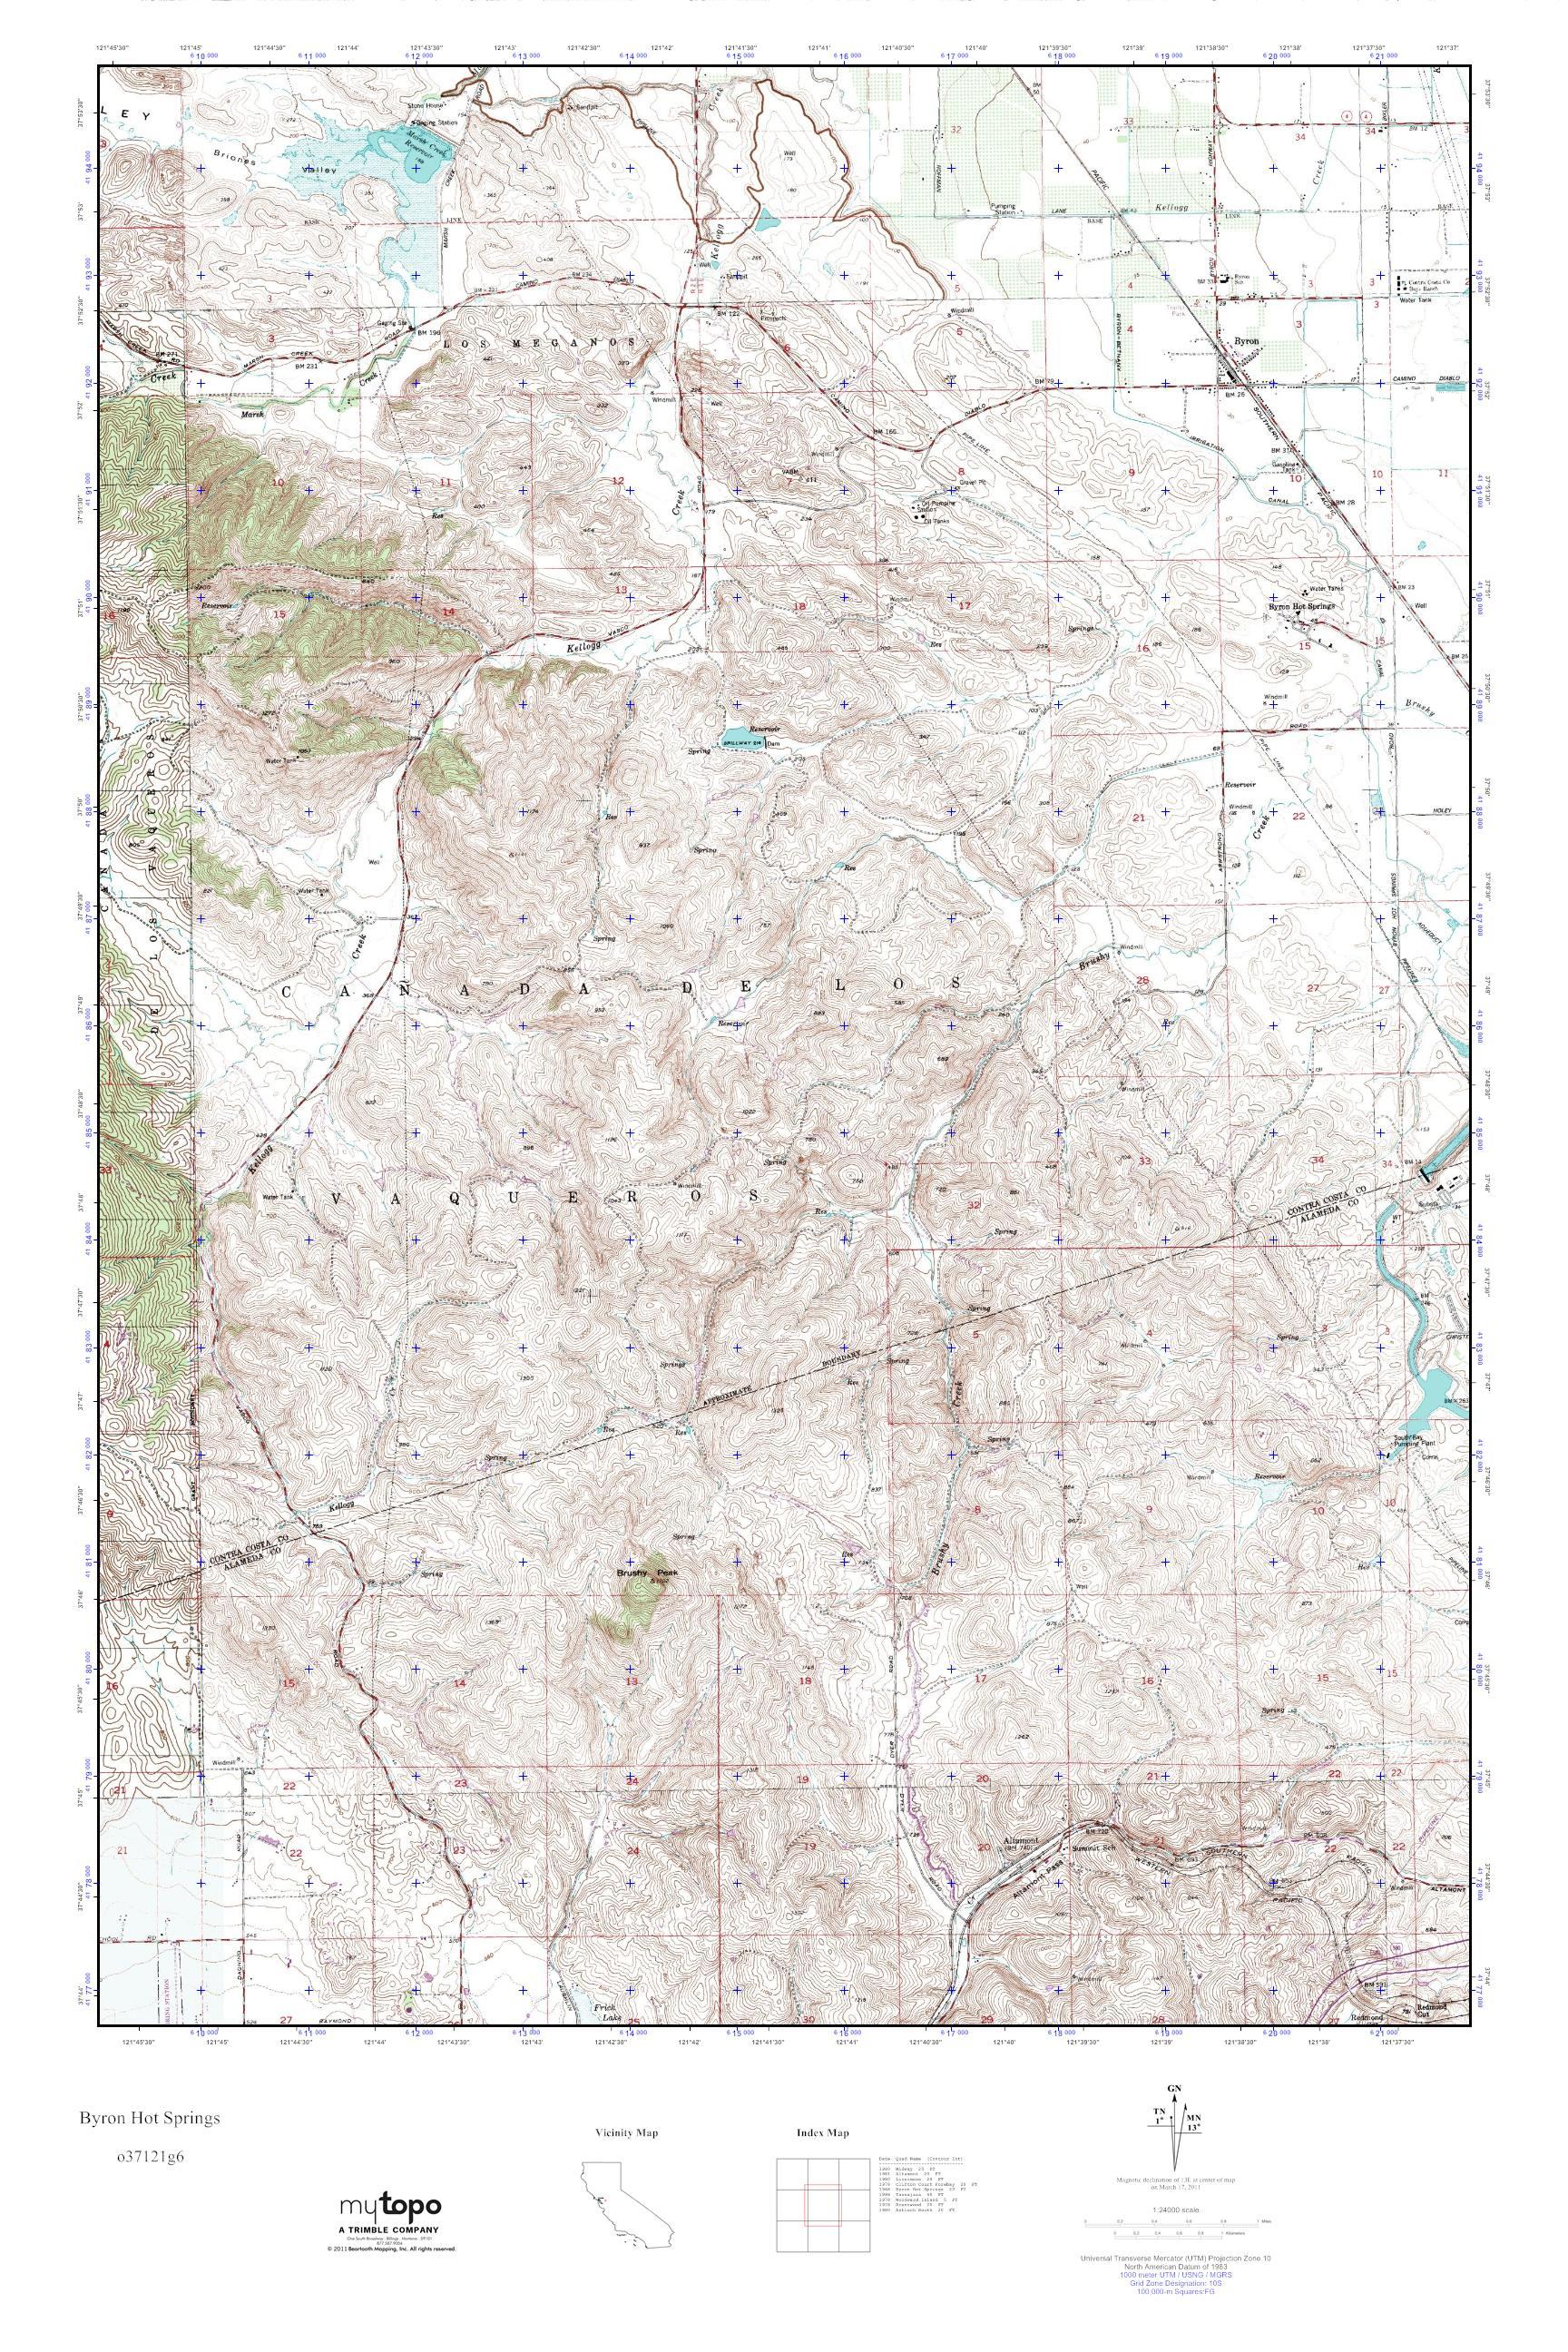 o37121g6 Camarillo Map on lower lake map, covina hills map, point hueneme map, ventura county map, chualar map, westlake village map, hayfork map, 1000 palms map, hope ranch map, saddleback valley map, cedar ridge map, saticoy map, casmalia map, oxnard map, auberry map, camp nelson map, thousand oaks map, los angeles map, fish camp map, burney map,